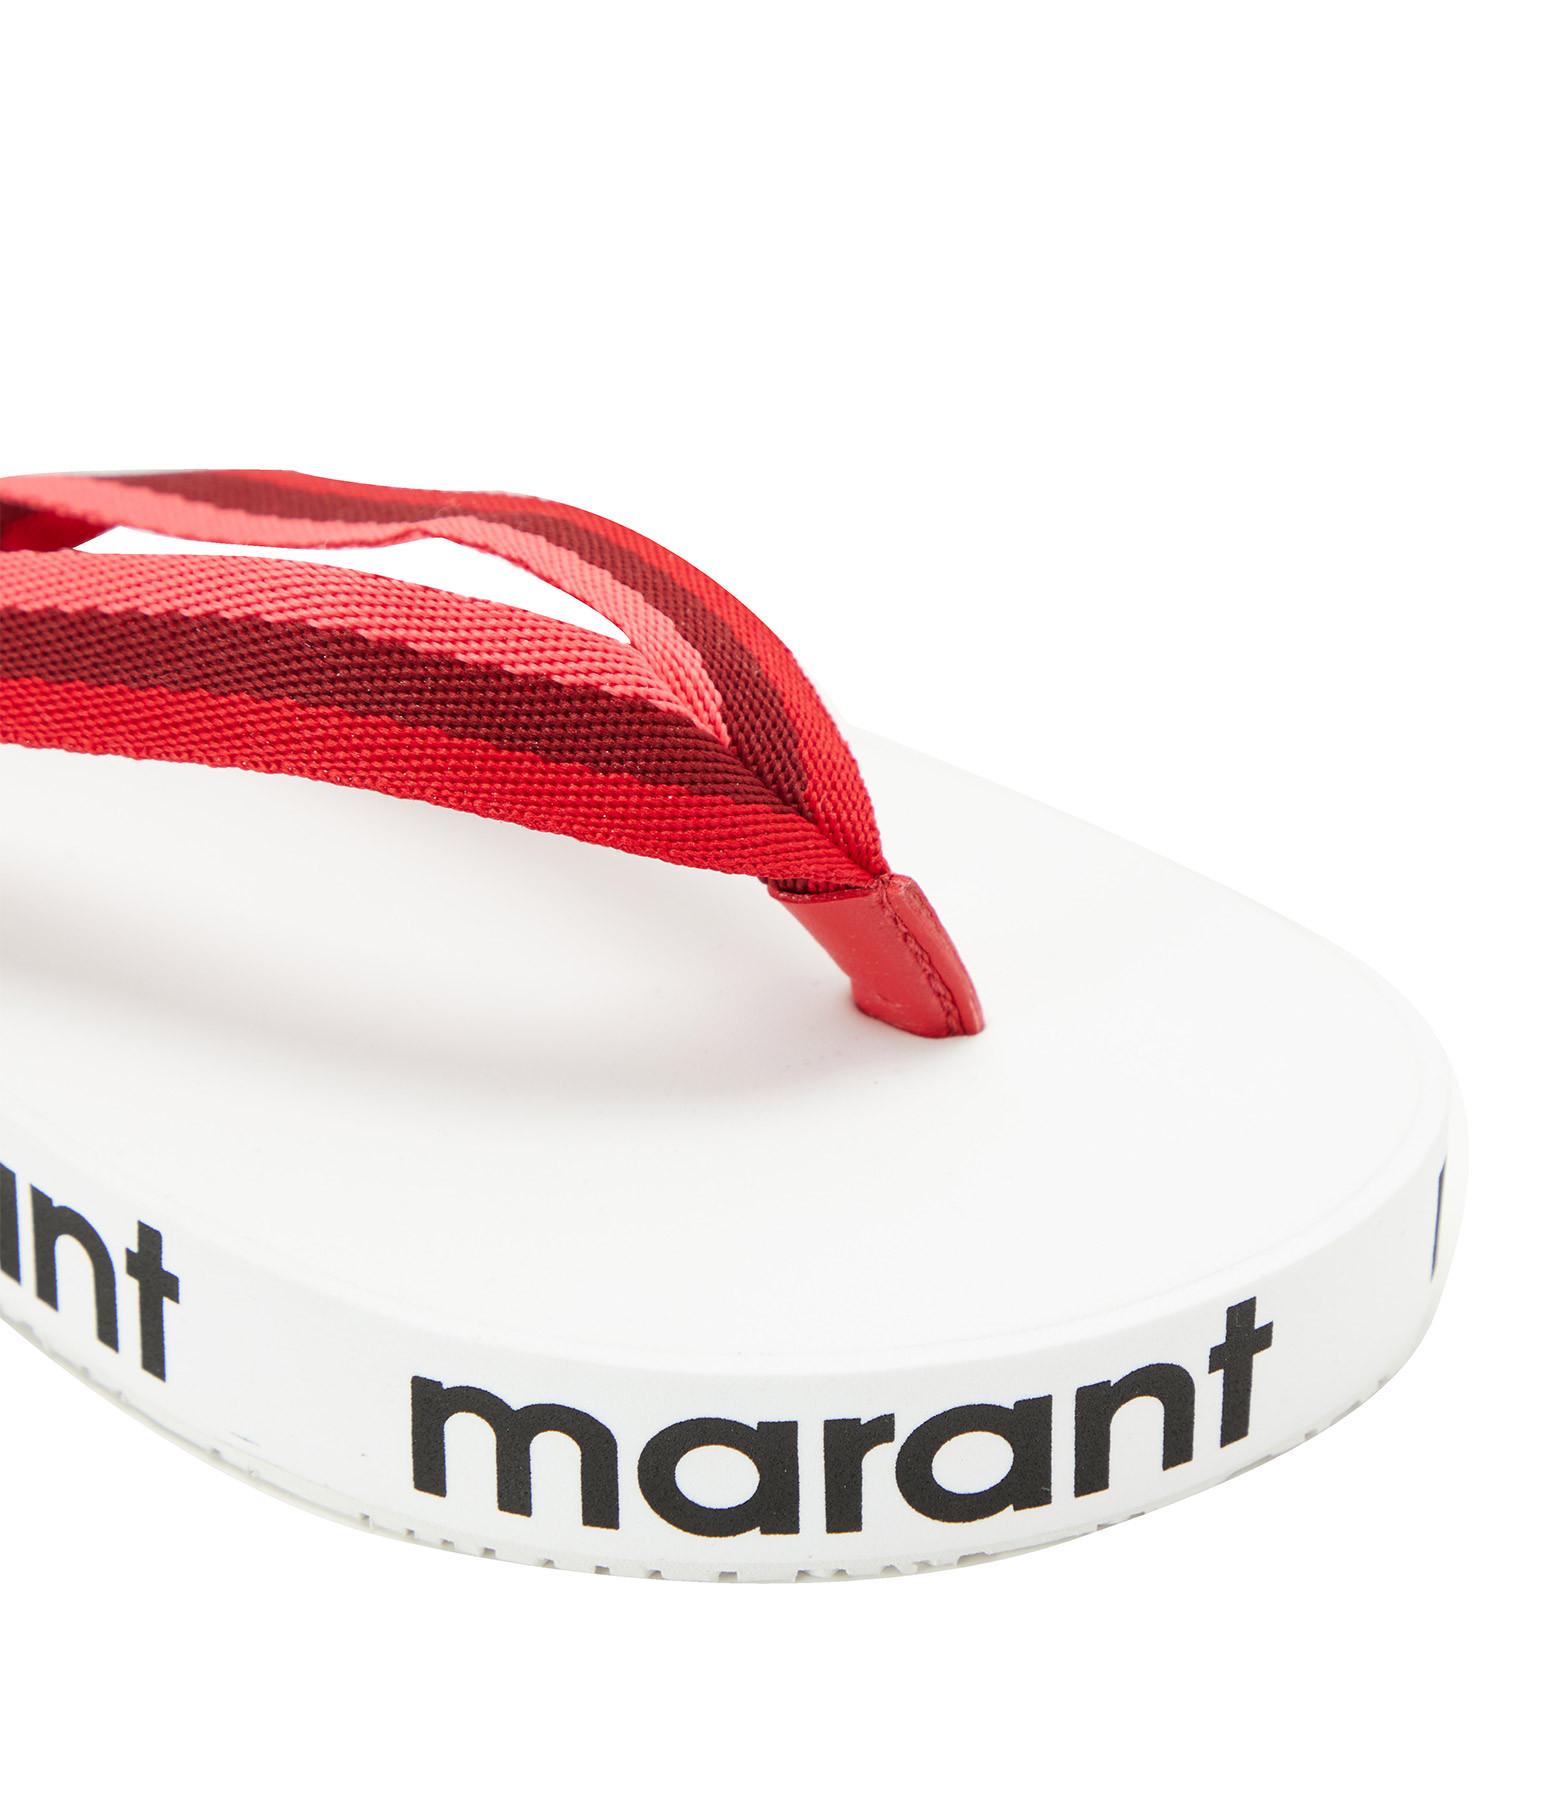 ISABEL MARANT - Tongs Compensées Tae Rouge